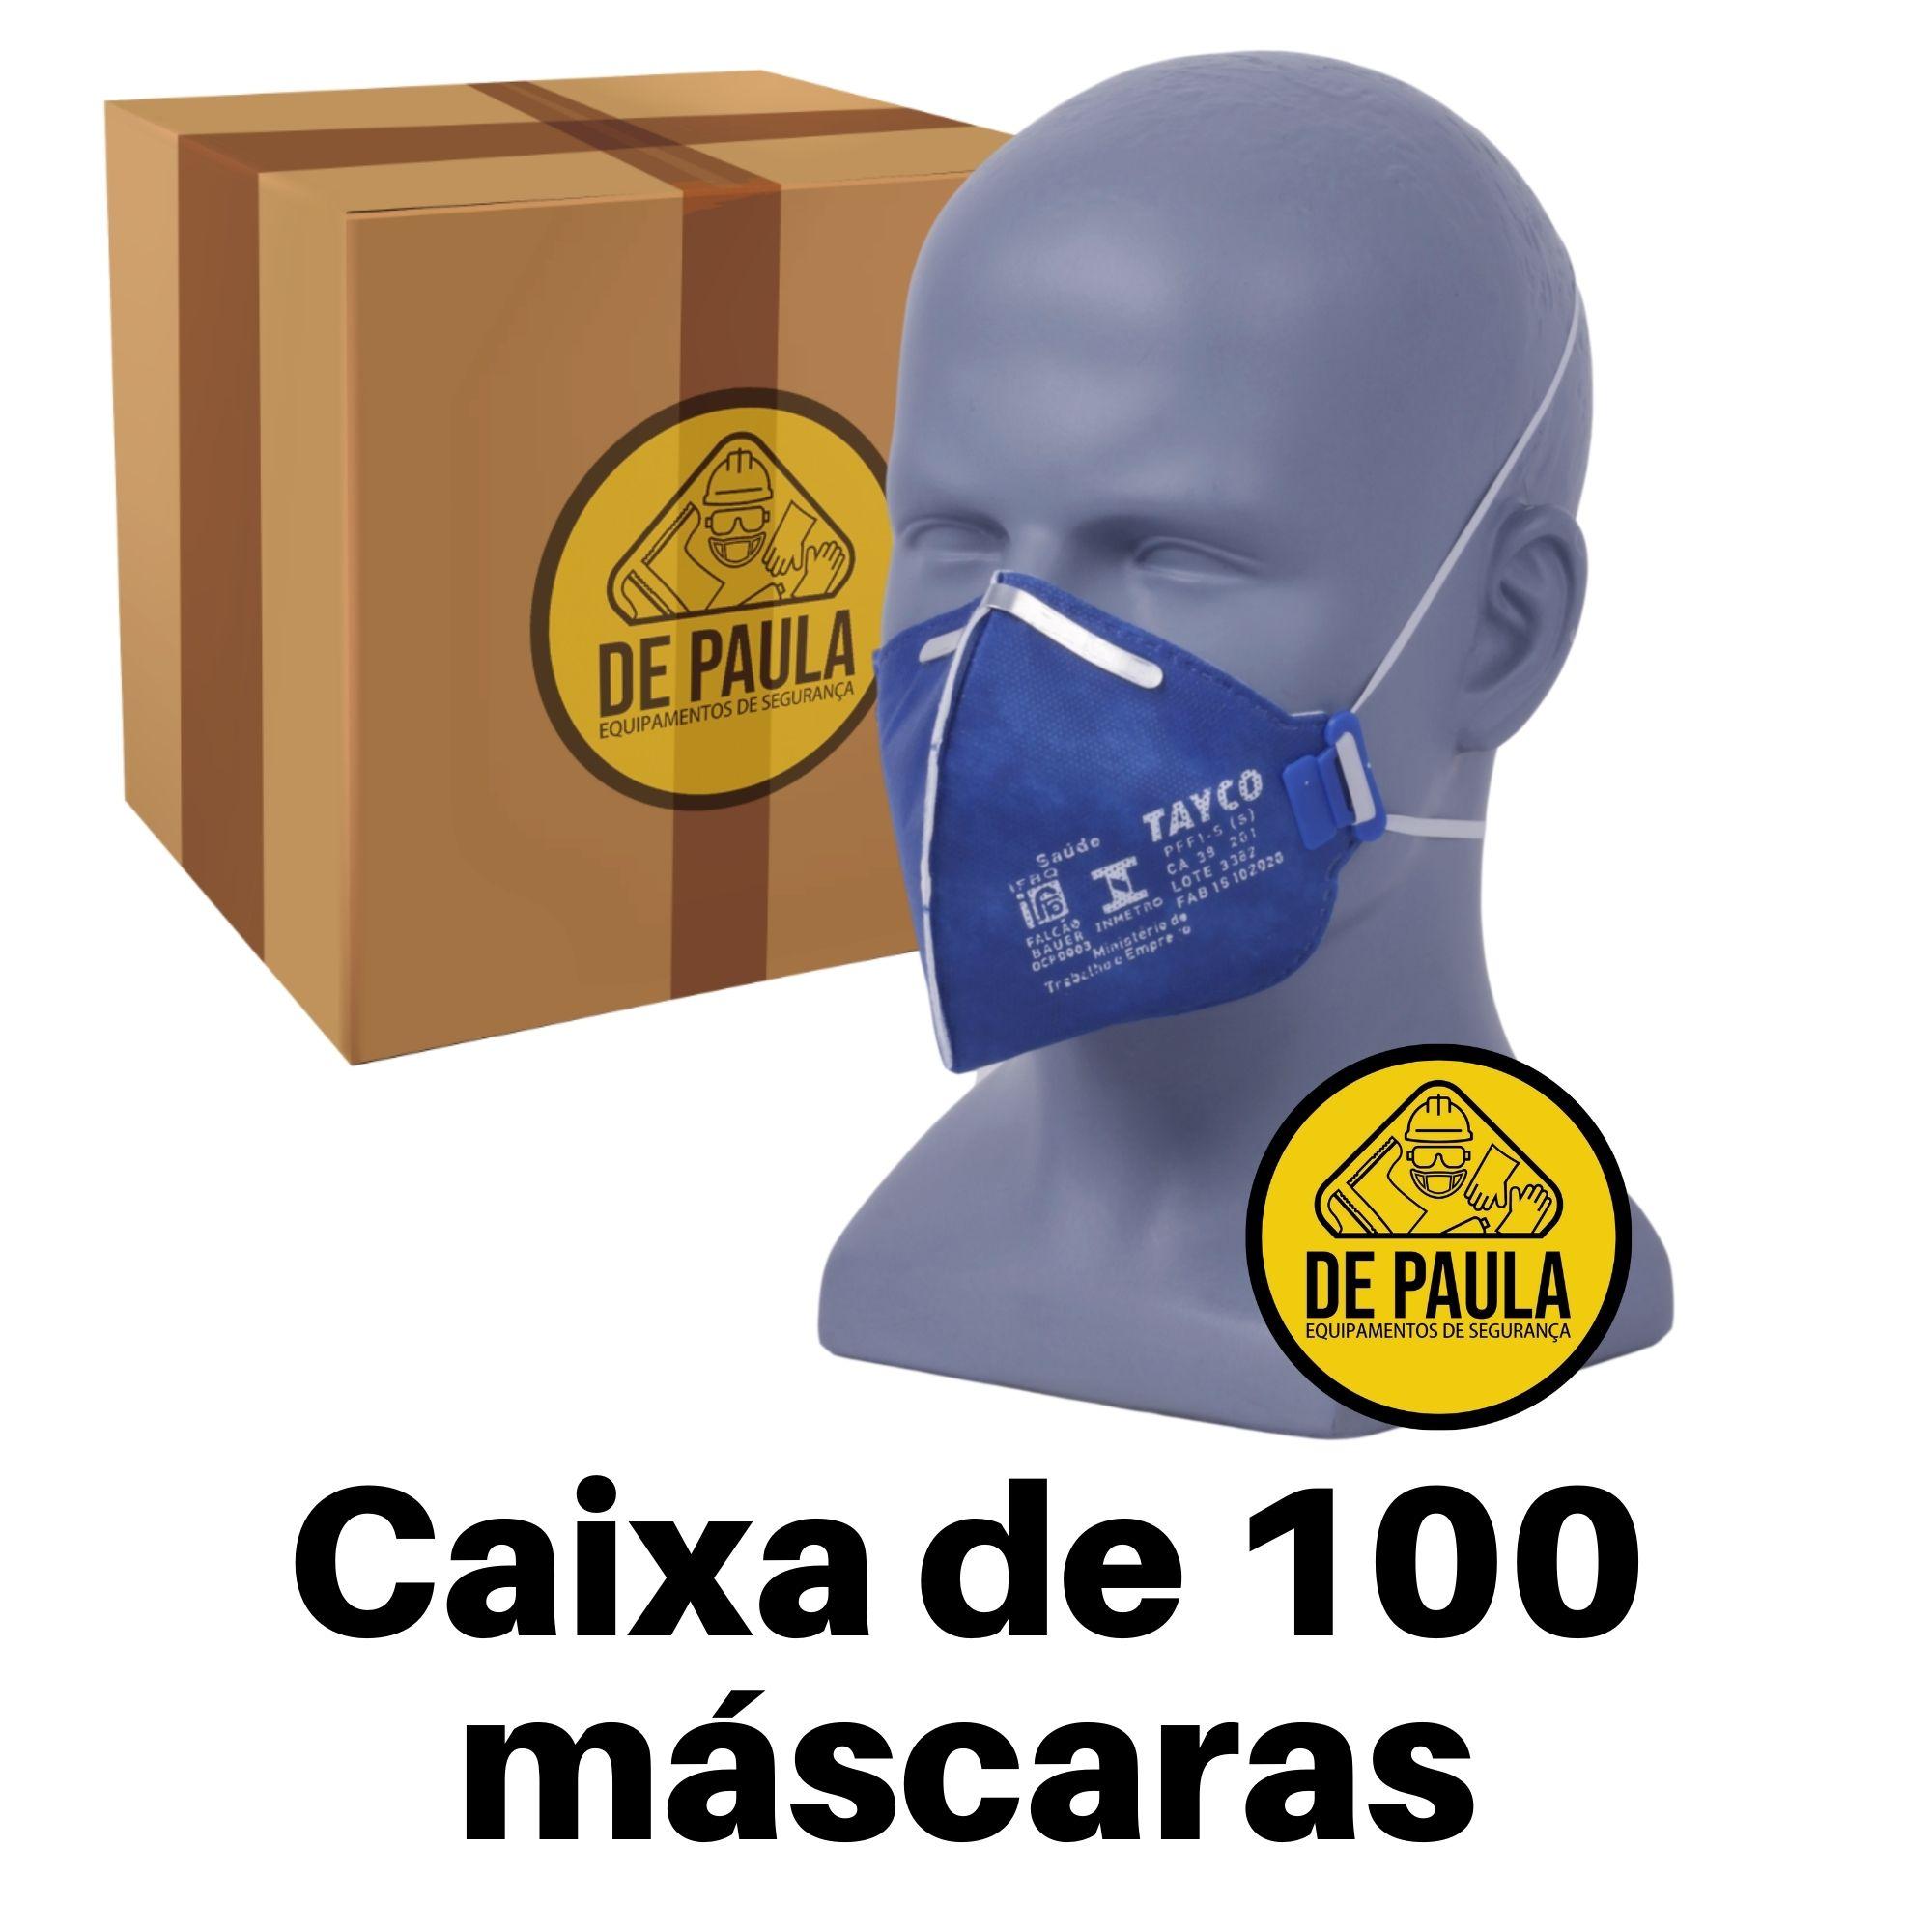 CAIXA COM 100 UN - MÁSCARA DESCARTÁVEL PFF1 SEM VÁLVULA  AZUL TAYCO  - DE PAULA EPI